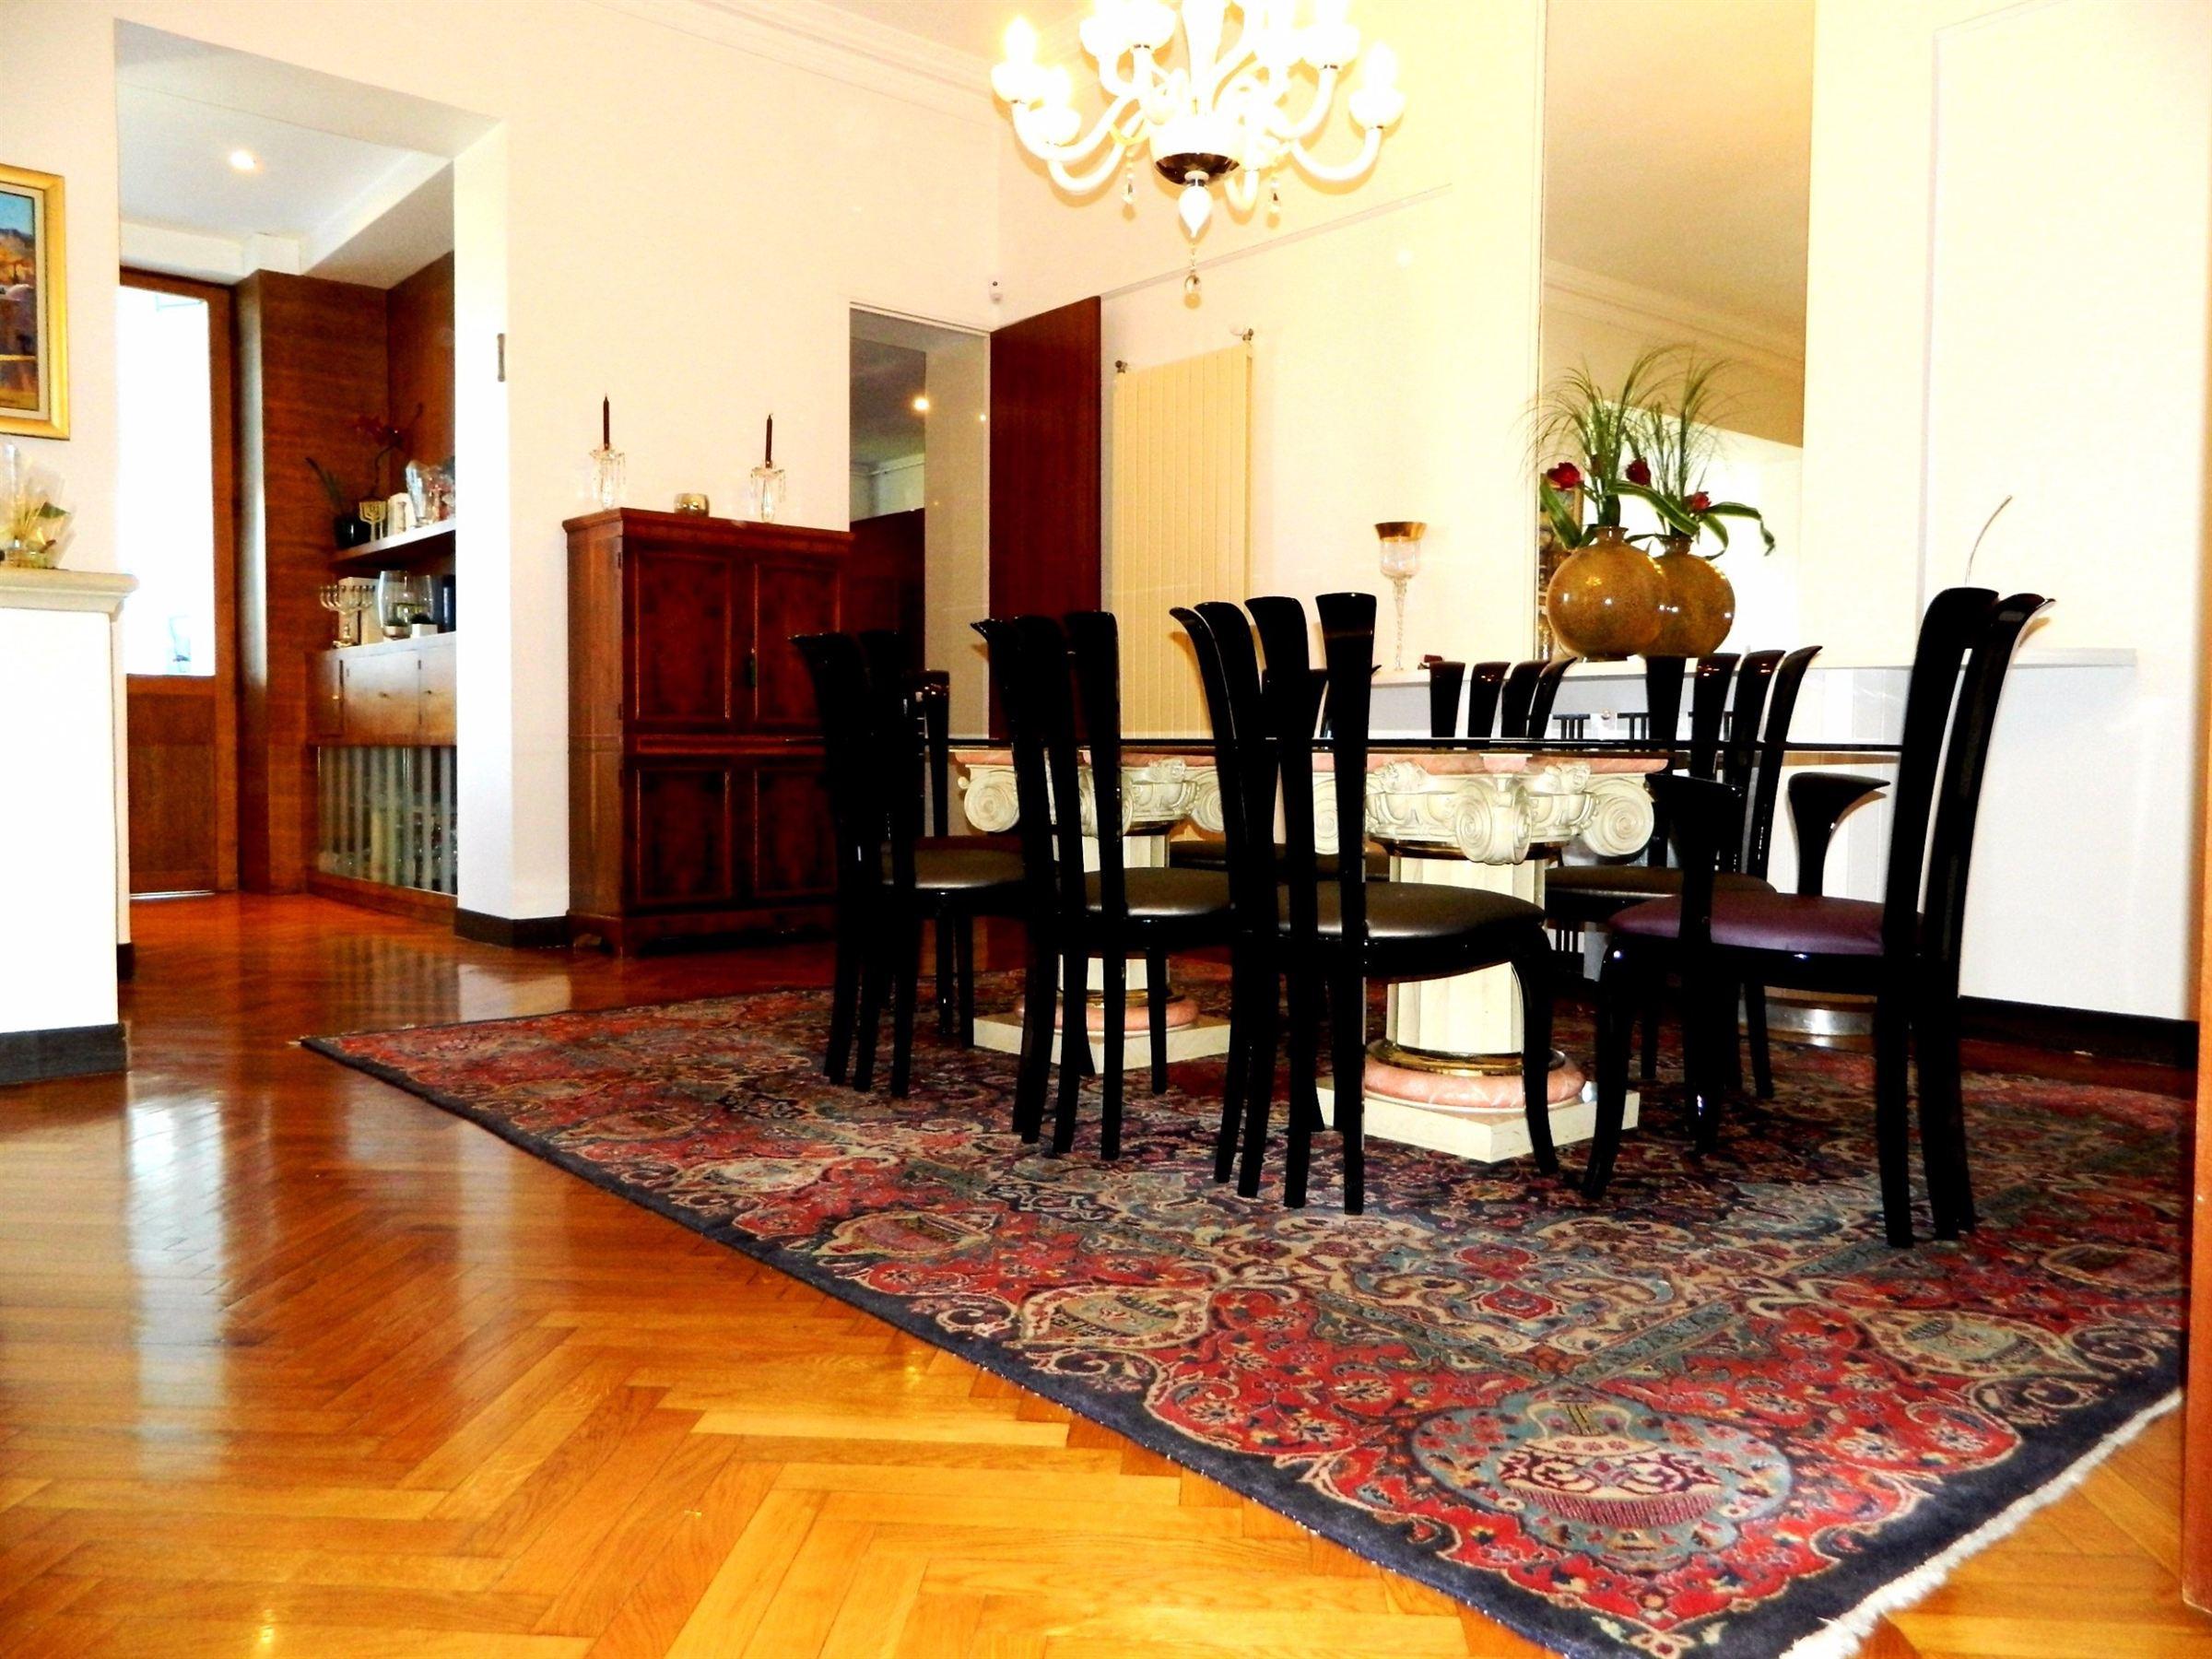 Apartamento por un Venta en PERRIER/PARADIS/PRADO - Magnifique T5 traversant de 237m² Marseille, Provincia - Alpes - Costa Azul, 13008 Francia